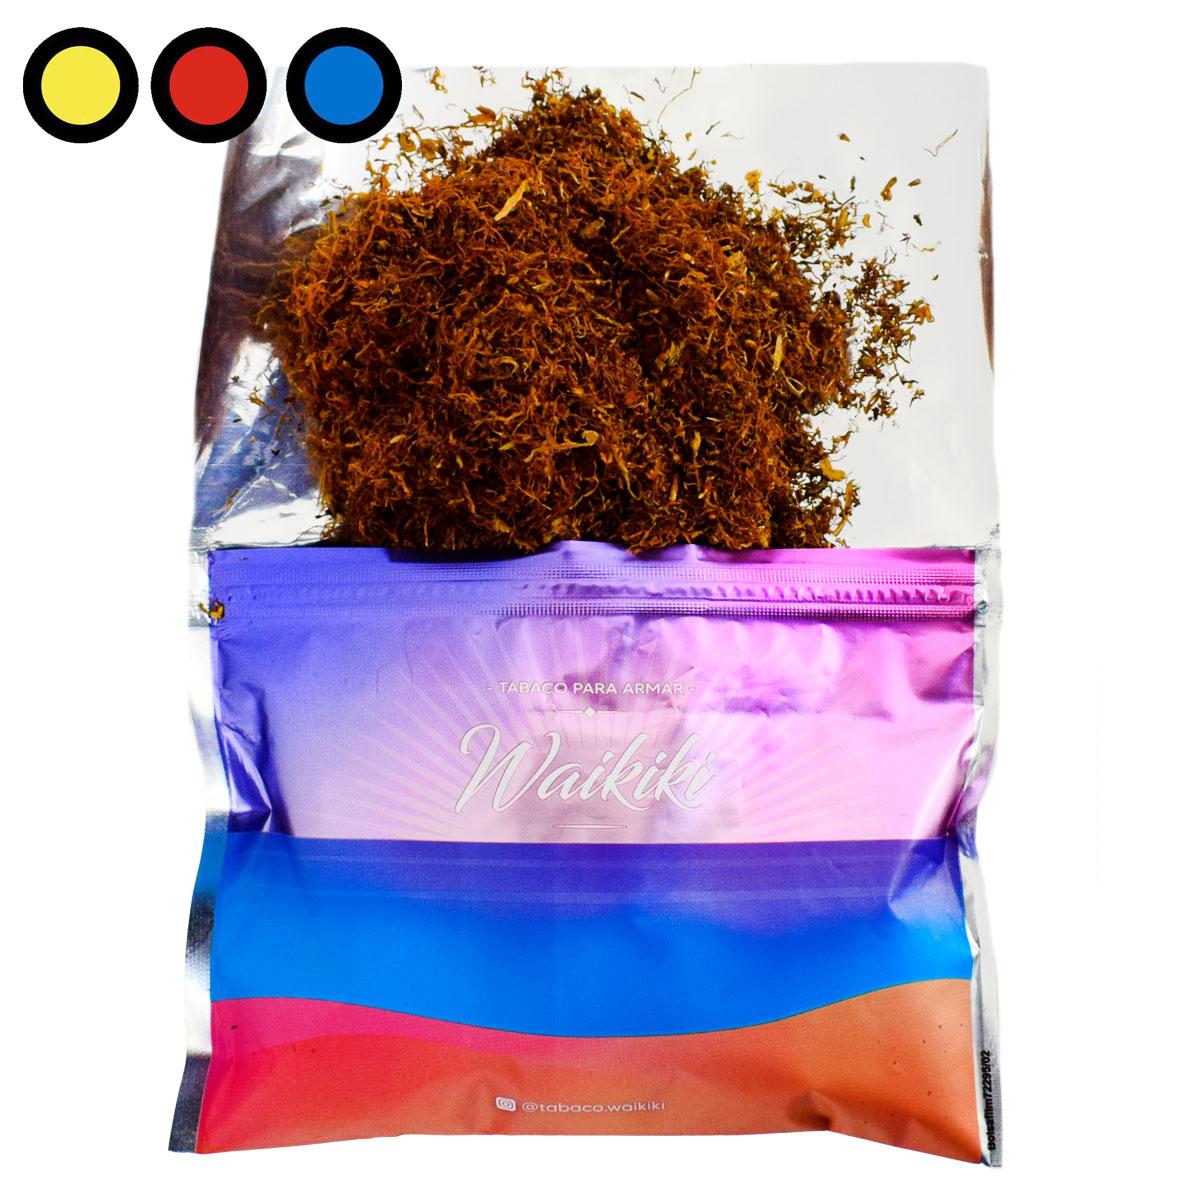 tabaco waikiki 30gr precios venta online